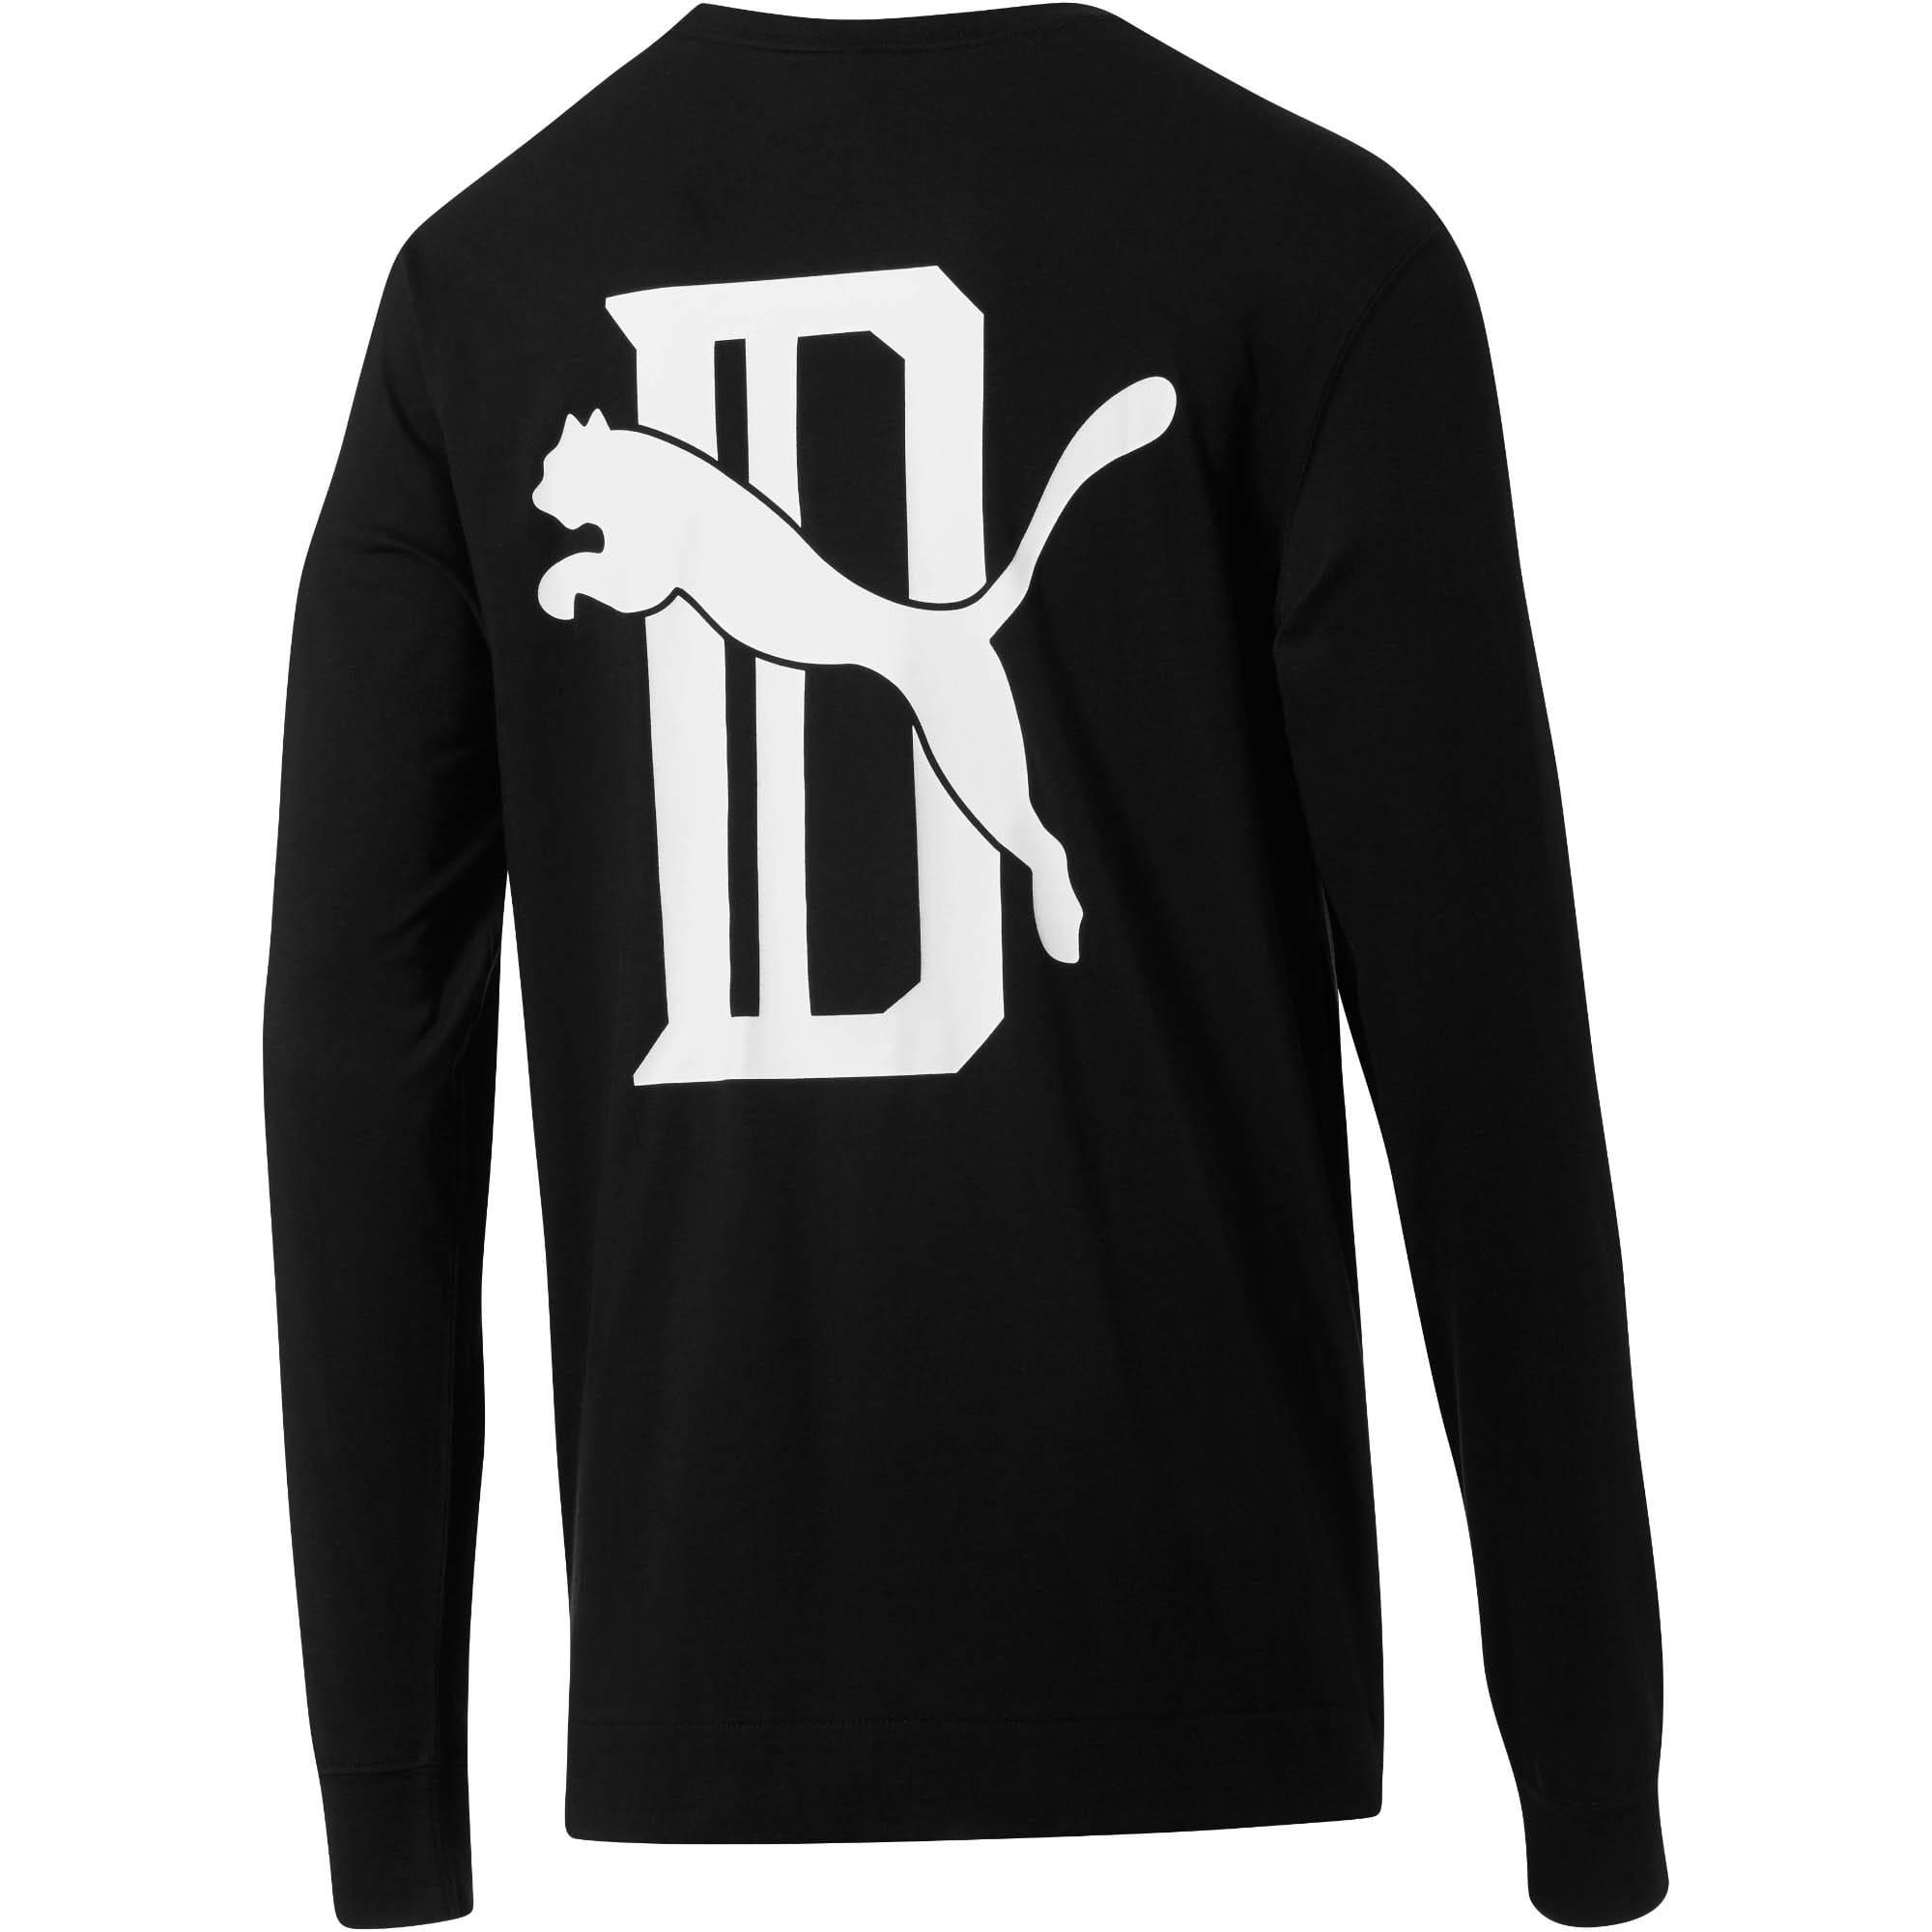 Thumbnail 2 of PUMA x Big Sean Logo Long Sleeve Shirt, Puma Black, medium